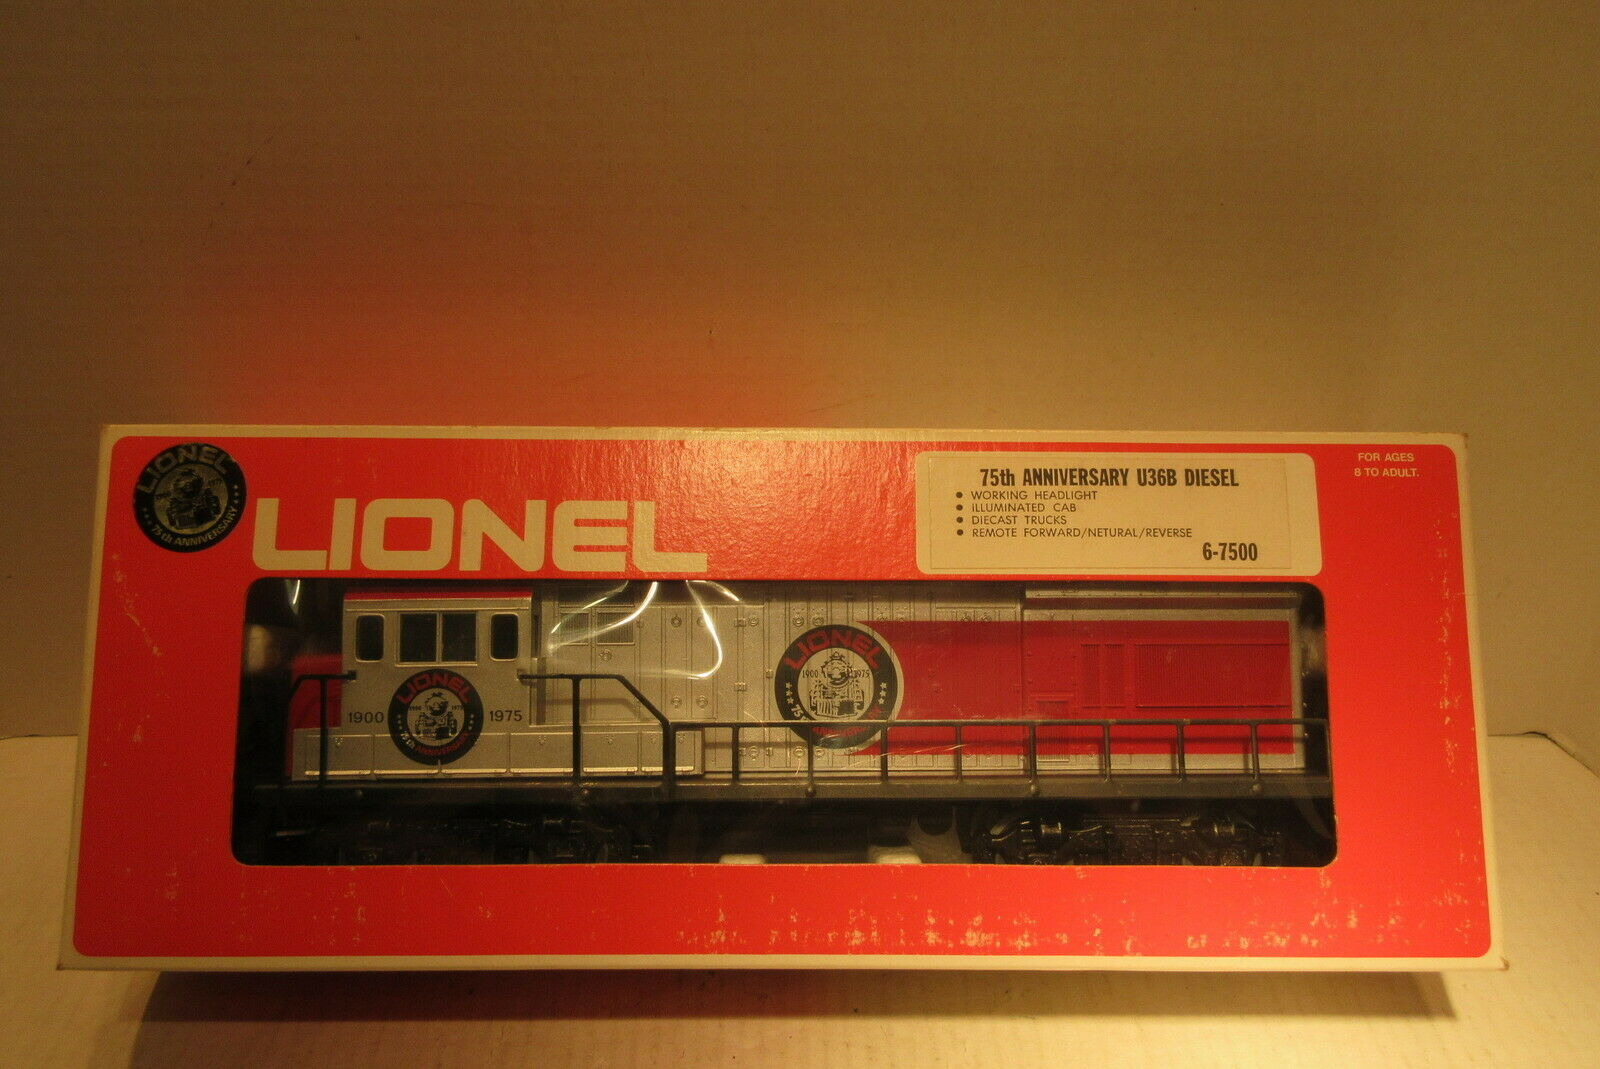 Lionel Train 6-7500 75th Anniversary U36B Diesel Engine O-Gauge